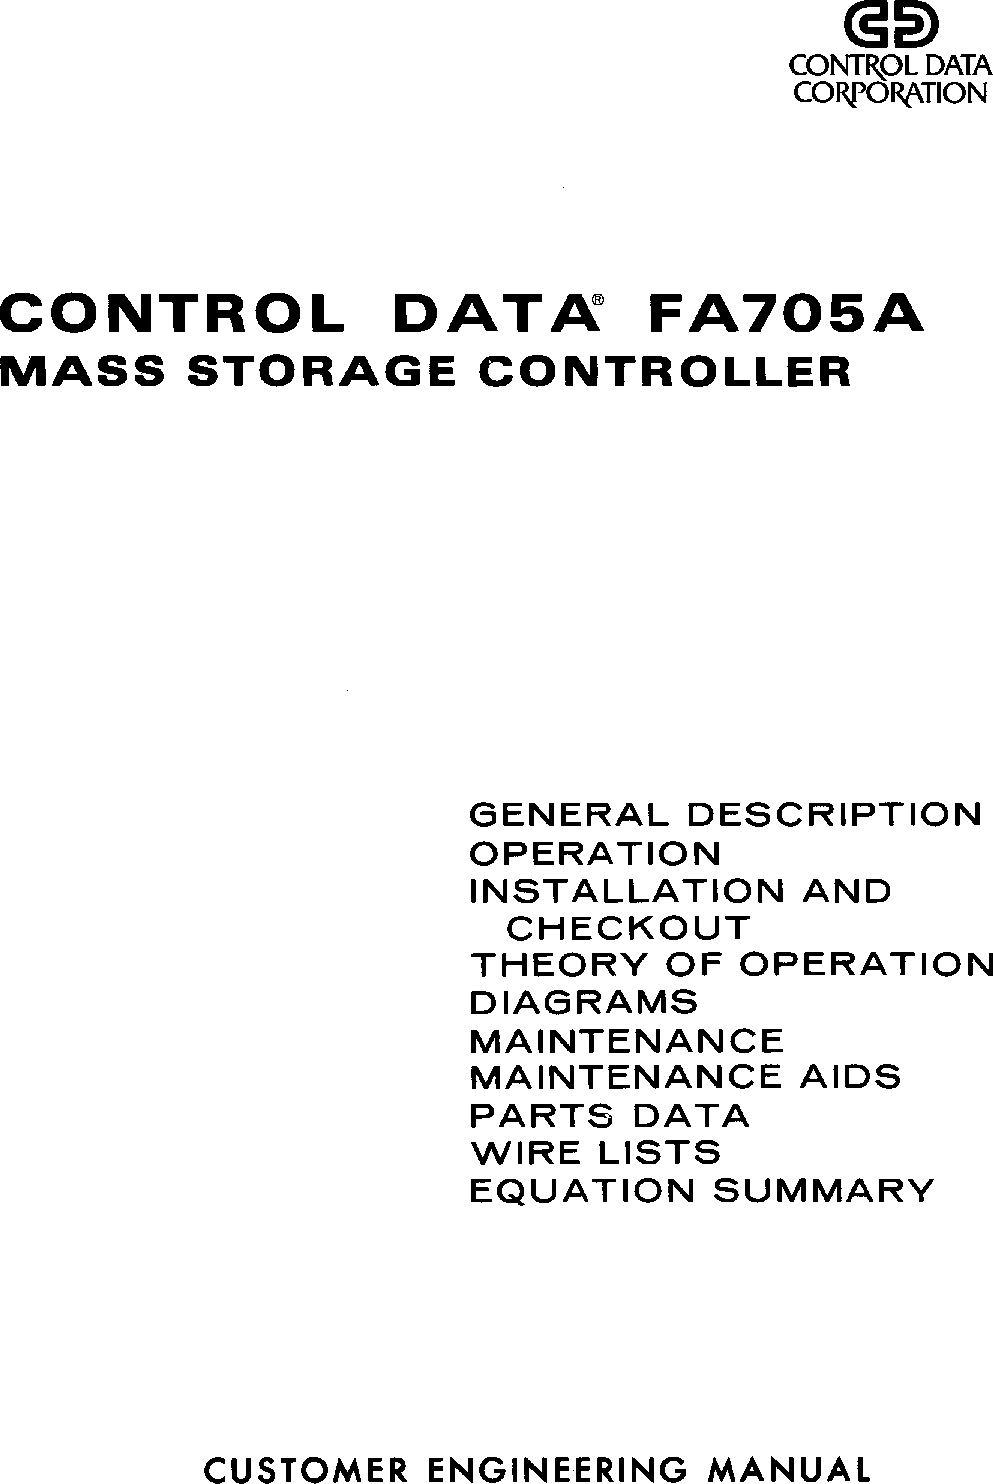 60290000S_FA705A_Mass_Storage_Controller_CE_Manual_Aug1976